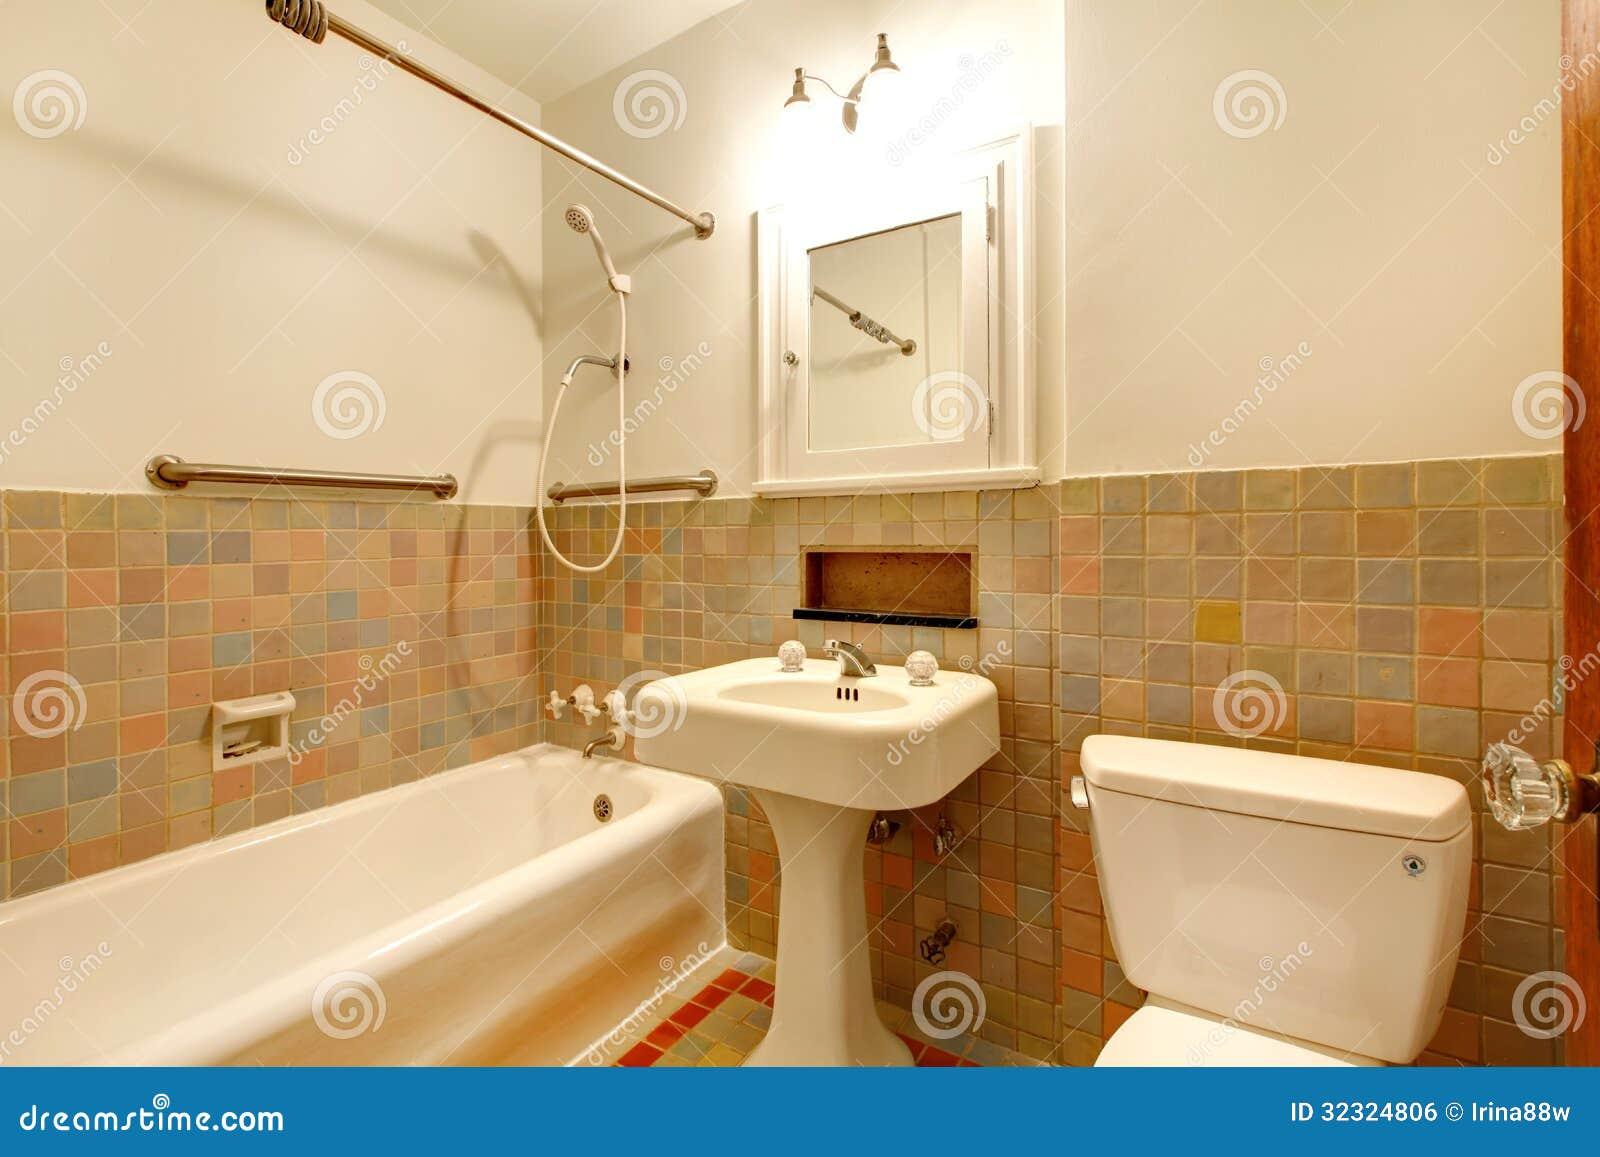 Oude badkamer opfrissen modern robuust eigentijdse badkamer de jong sanitair - Oude badkamer ...